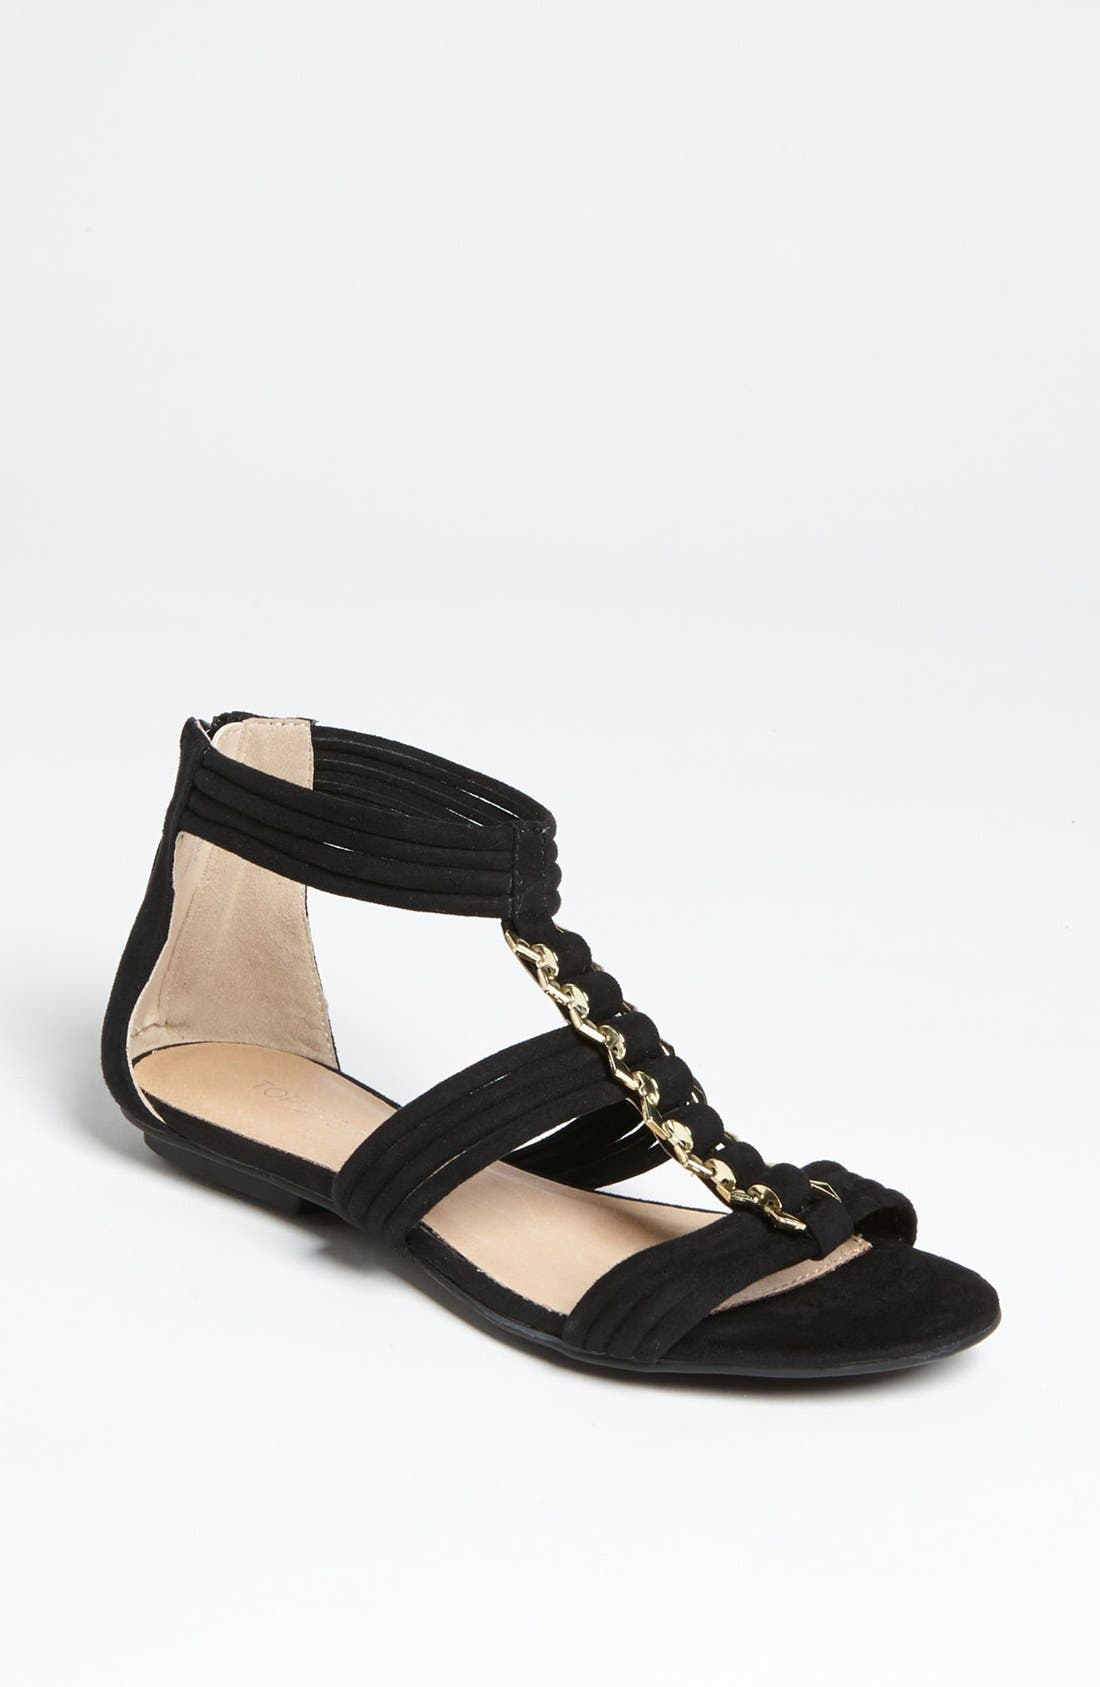 Main Image - Topshop 'Helena' Metal Trim Sandal